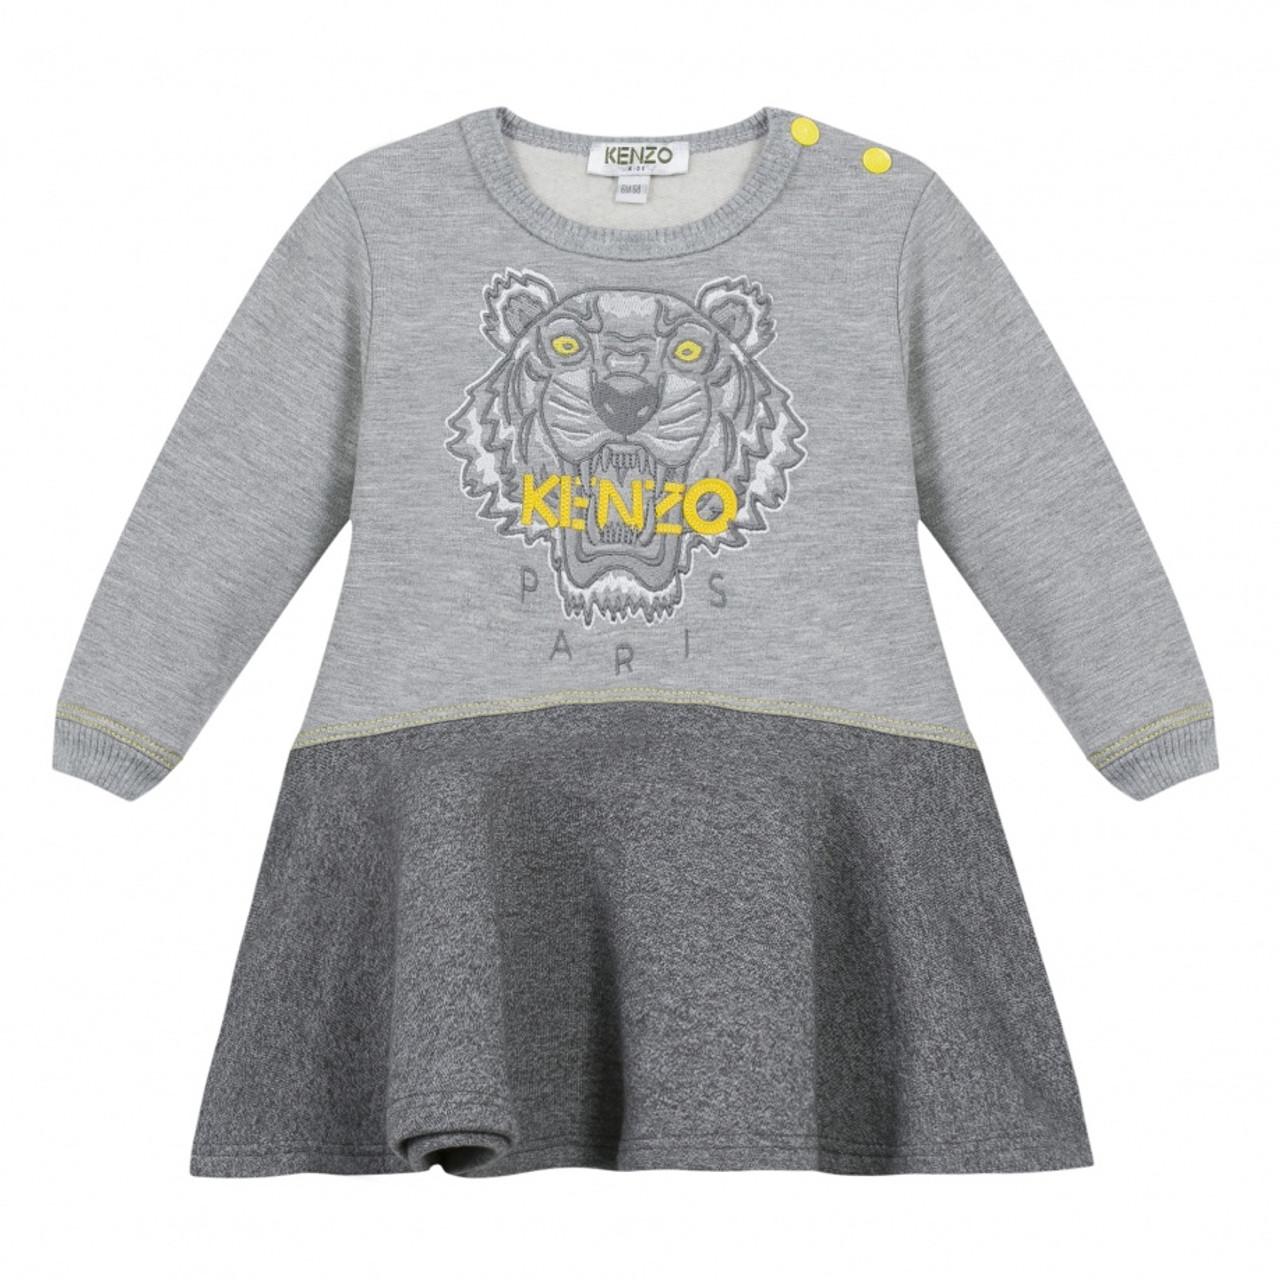 deee06c9e Kenzo Dress KI30147 - Le Petit Kids